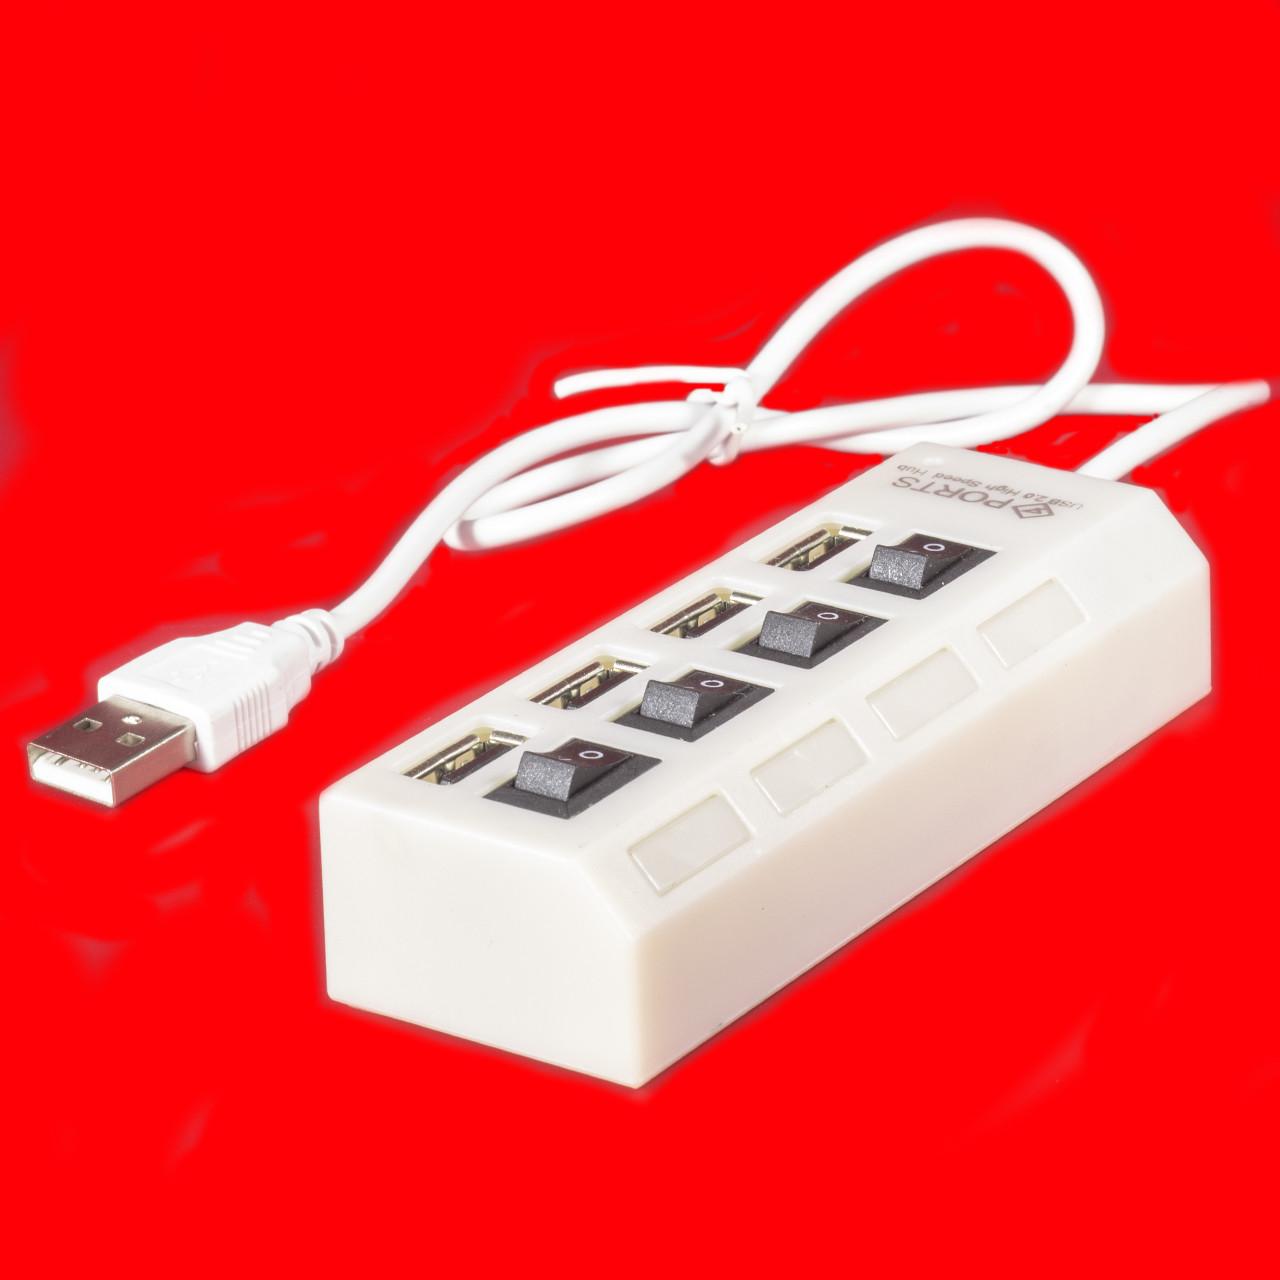 Концентратор USB 2.0 Ginzzu GR-487UAB 7-ми портовый +  адаптер